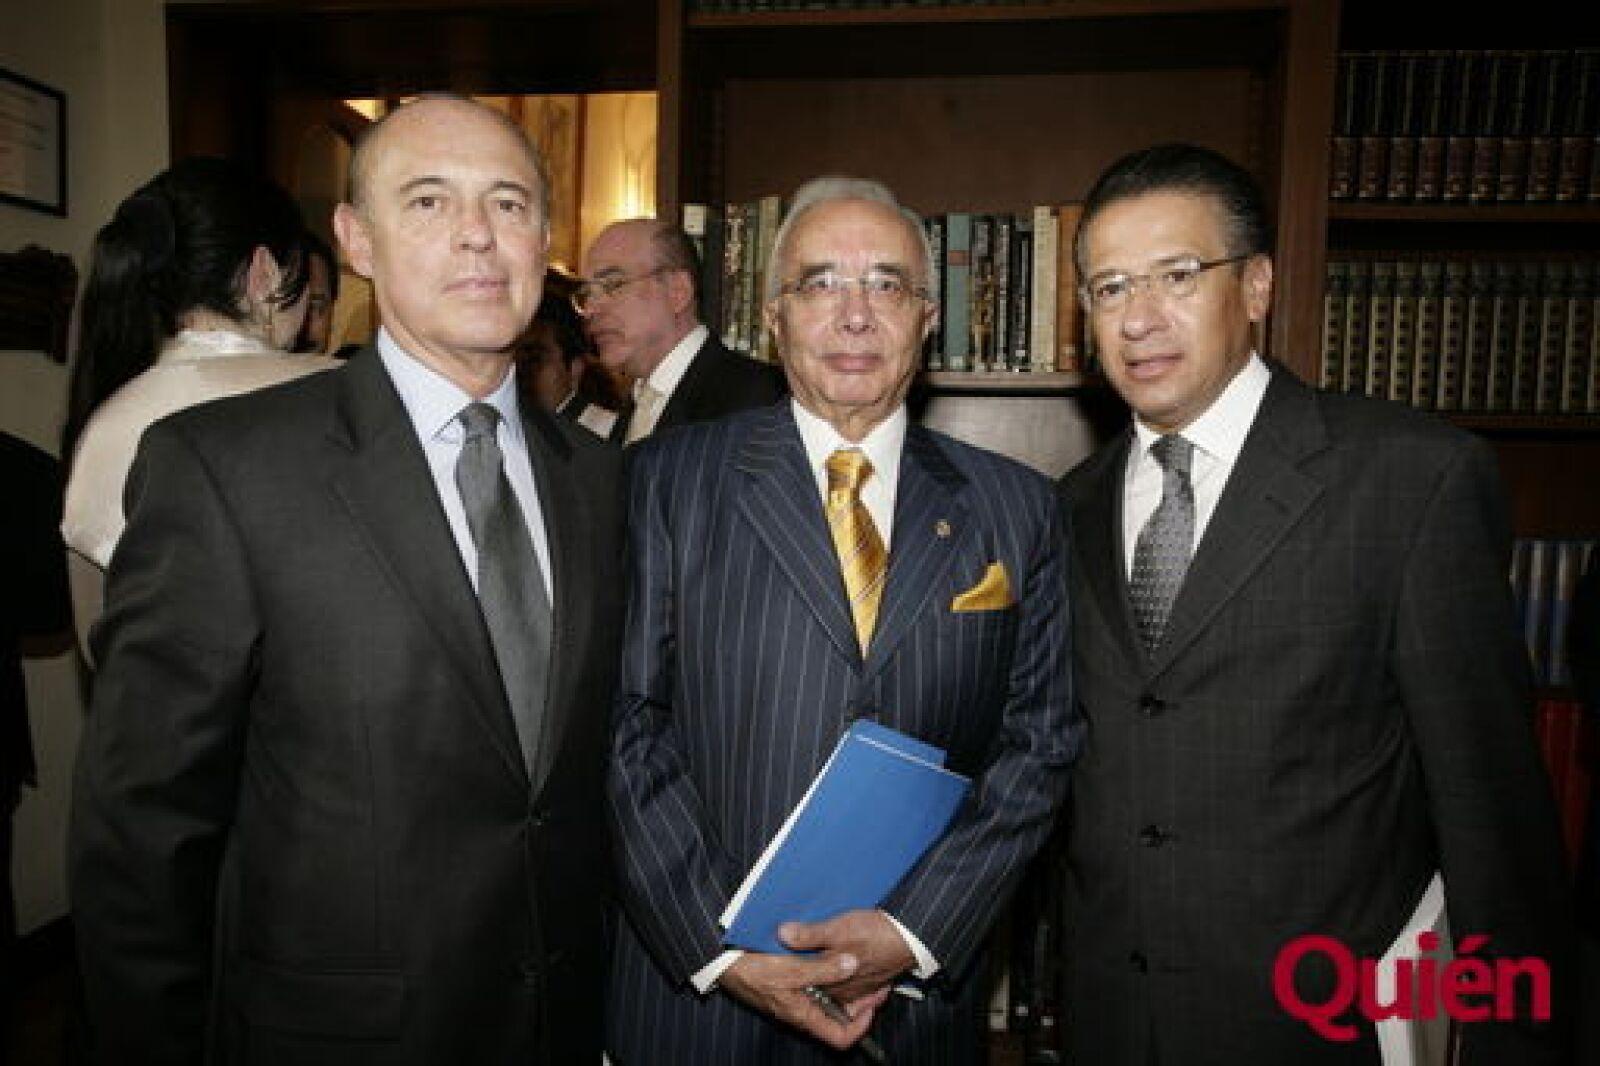 Hesiquio Aguilar, Julio Zamora, Salvador Mikel